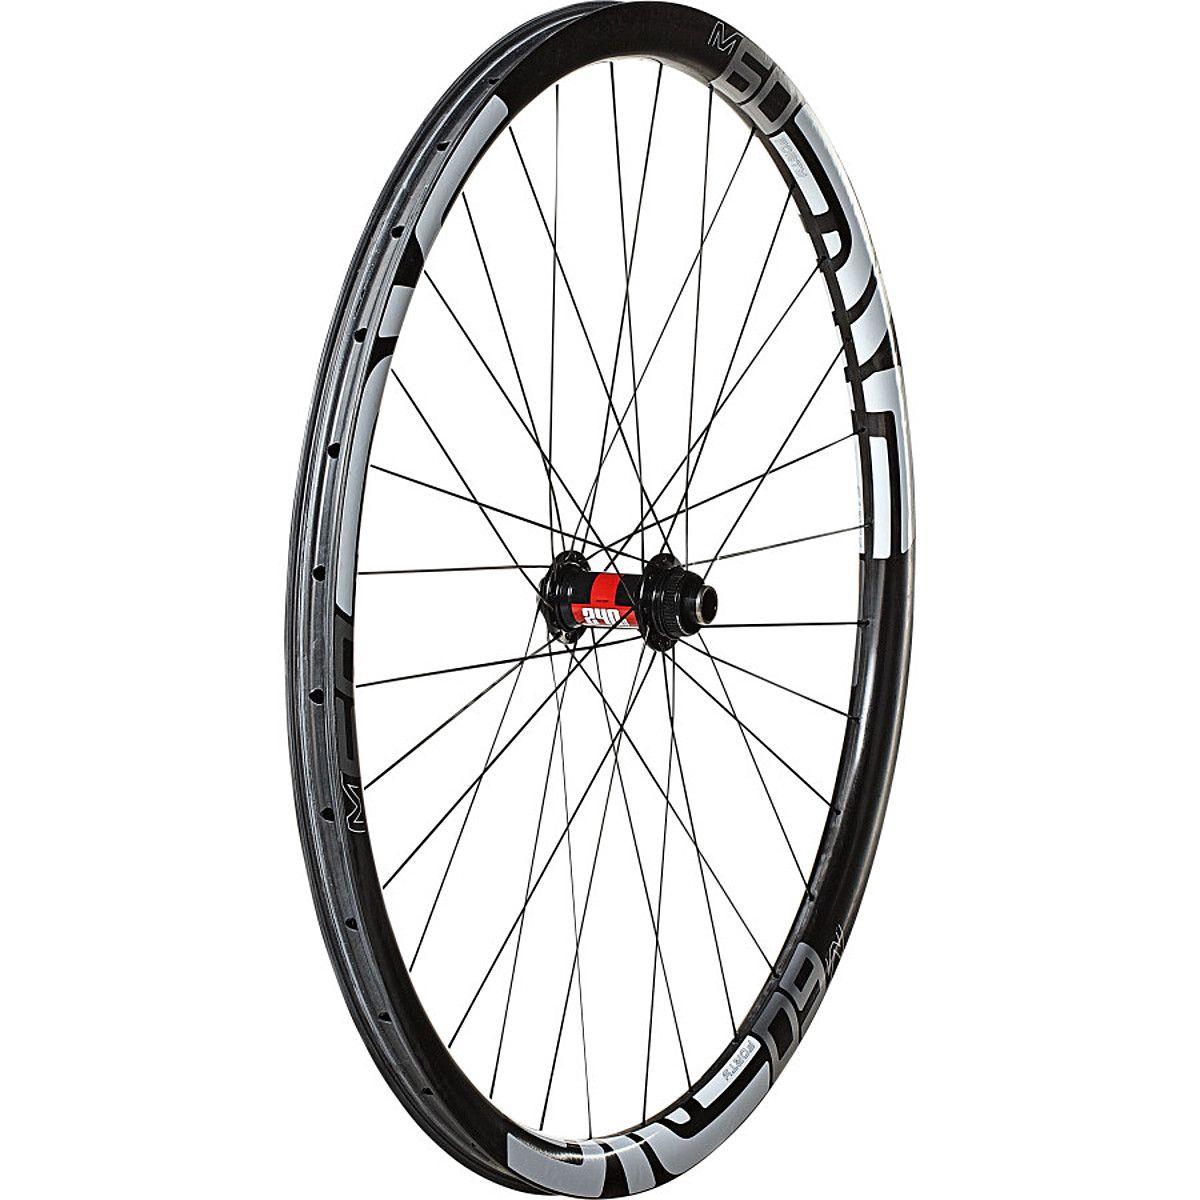 Enve M60 Forty 29in Wheelset All Thinks Bike Mountain Bike